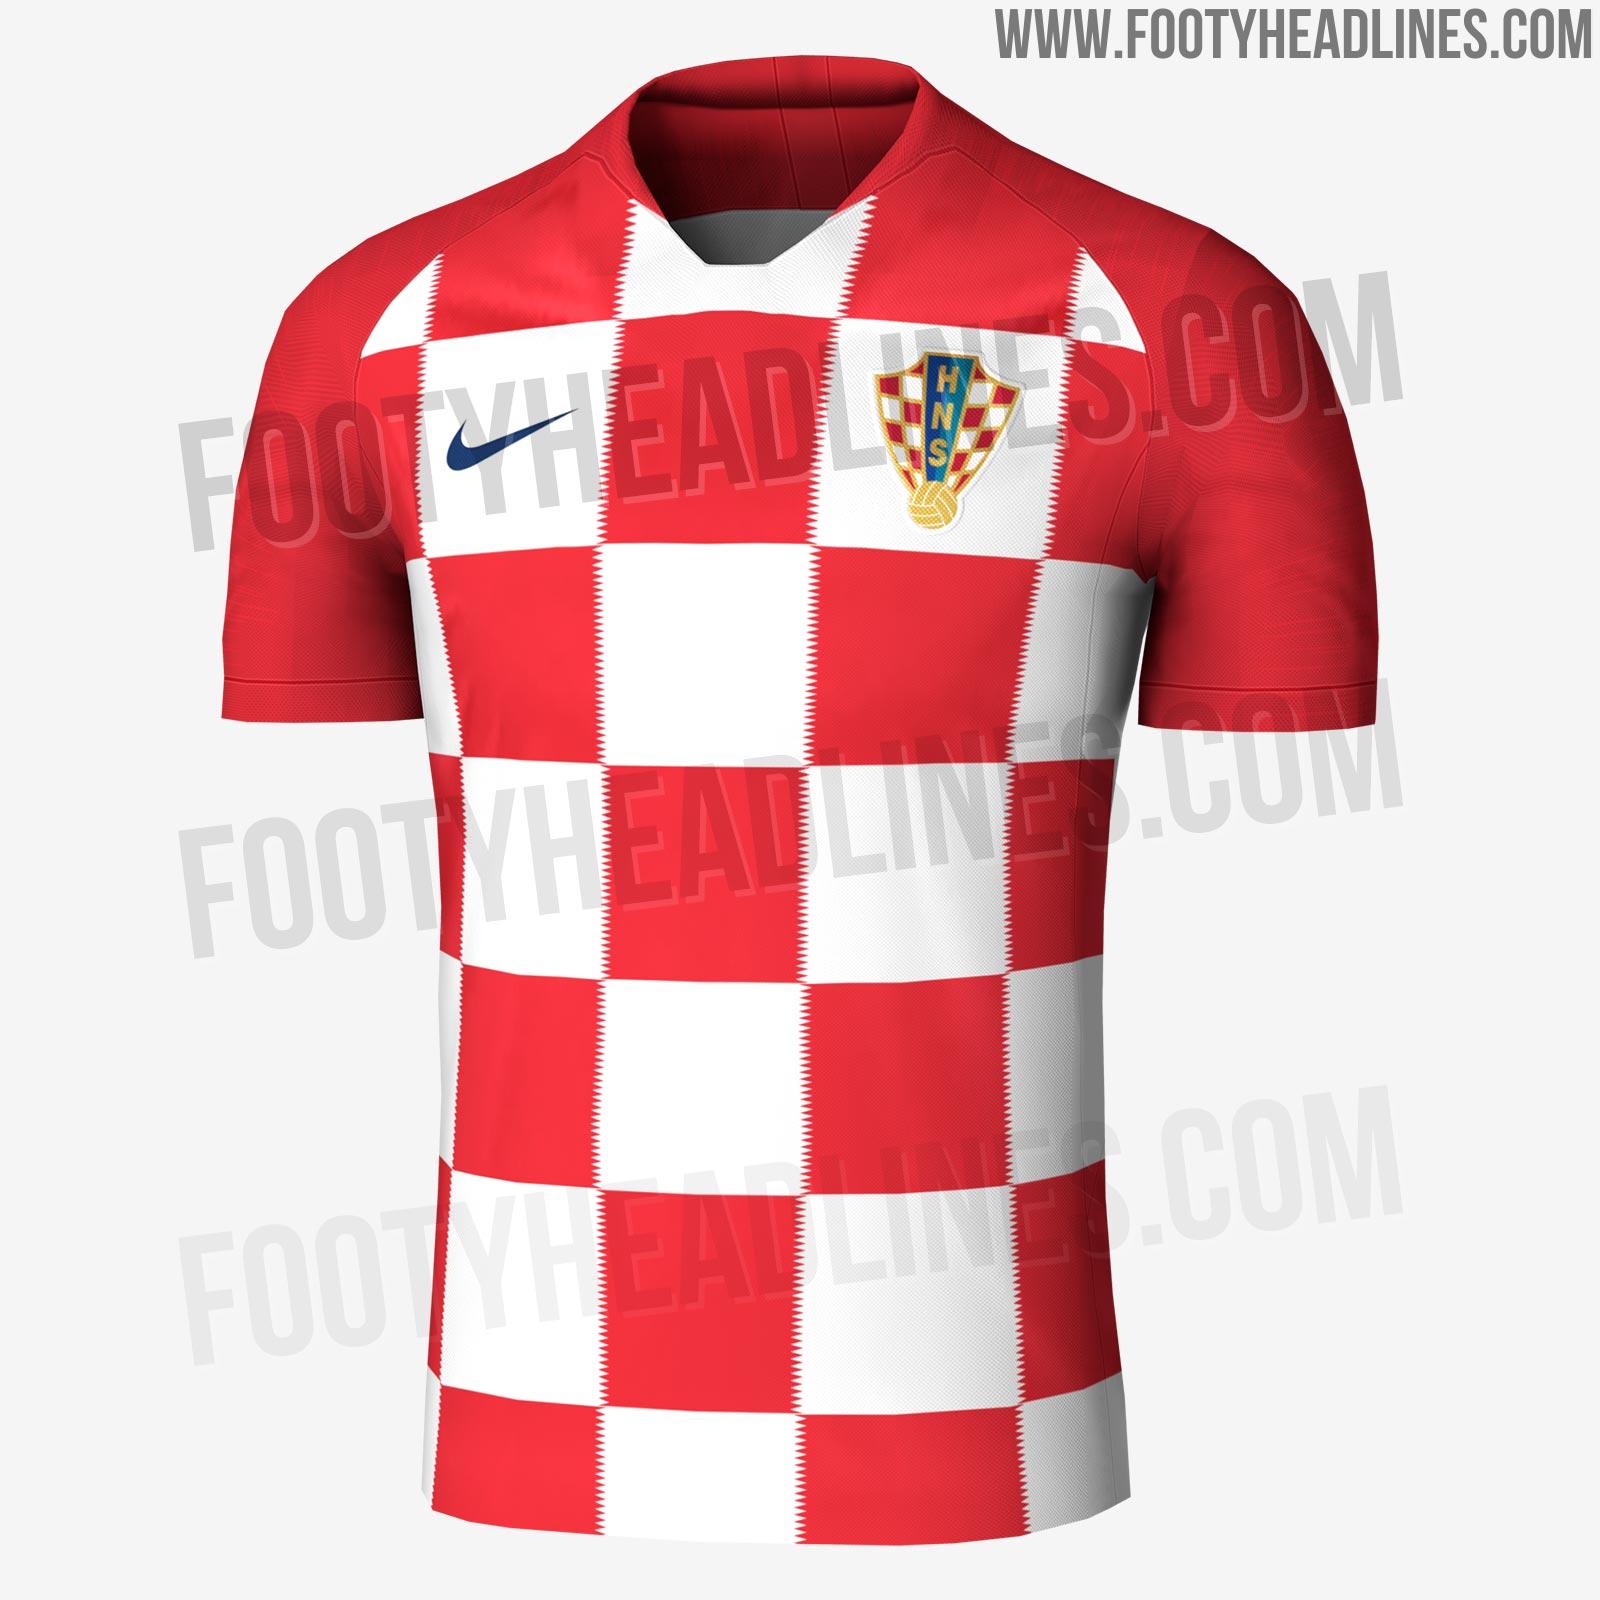 croatia-2018-world-cup-home-kit-2.jpg